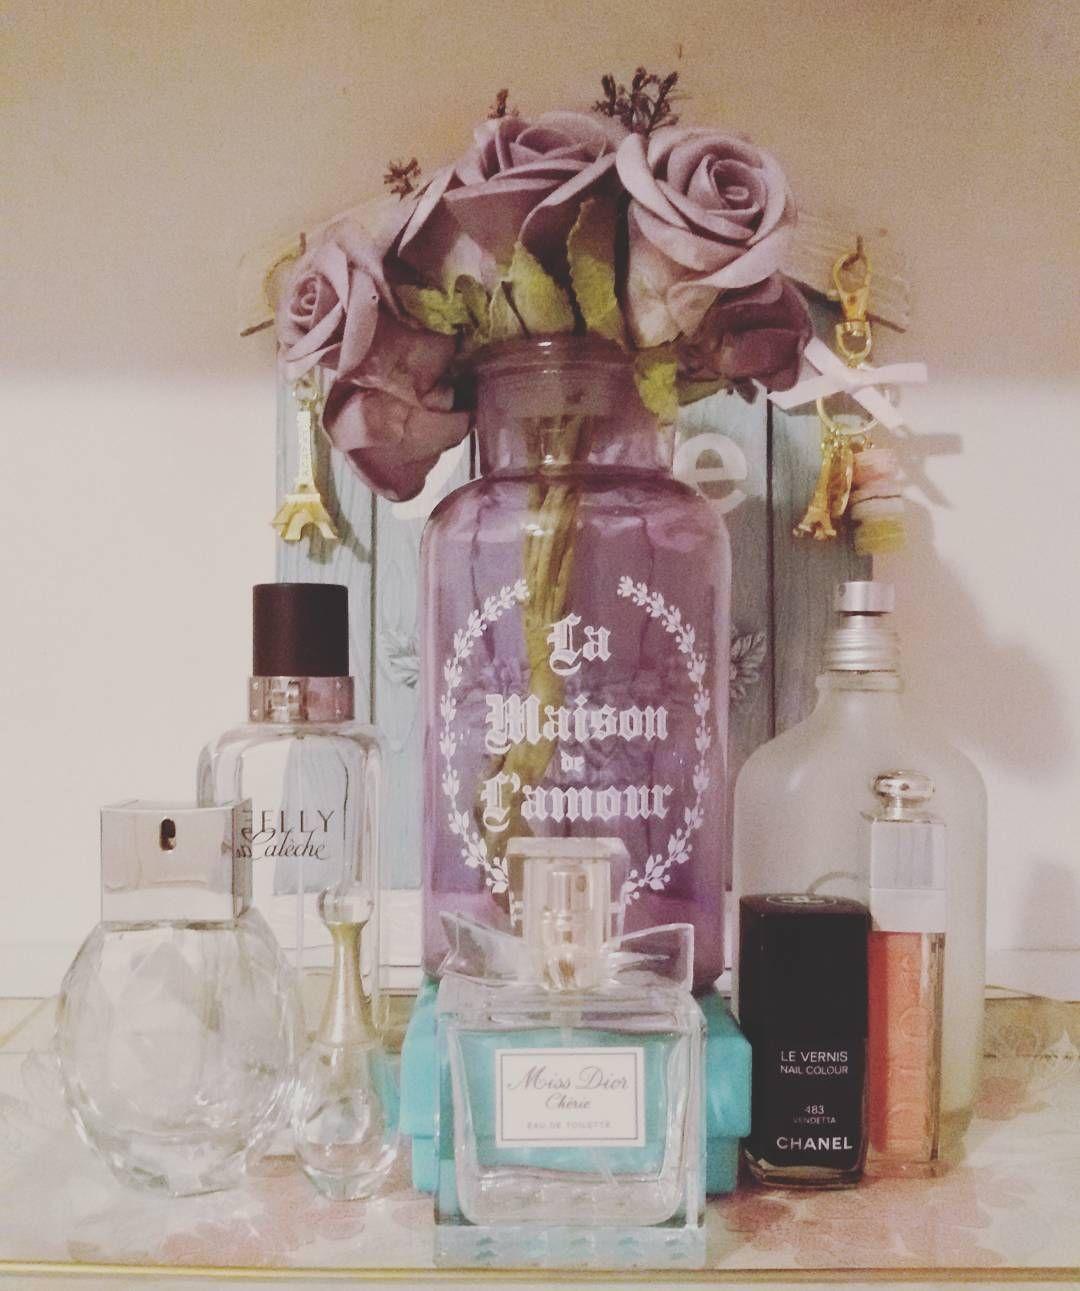 Vassoio rubato sogno realizzato! #myroom #parfum #flowers #girl